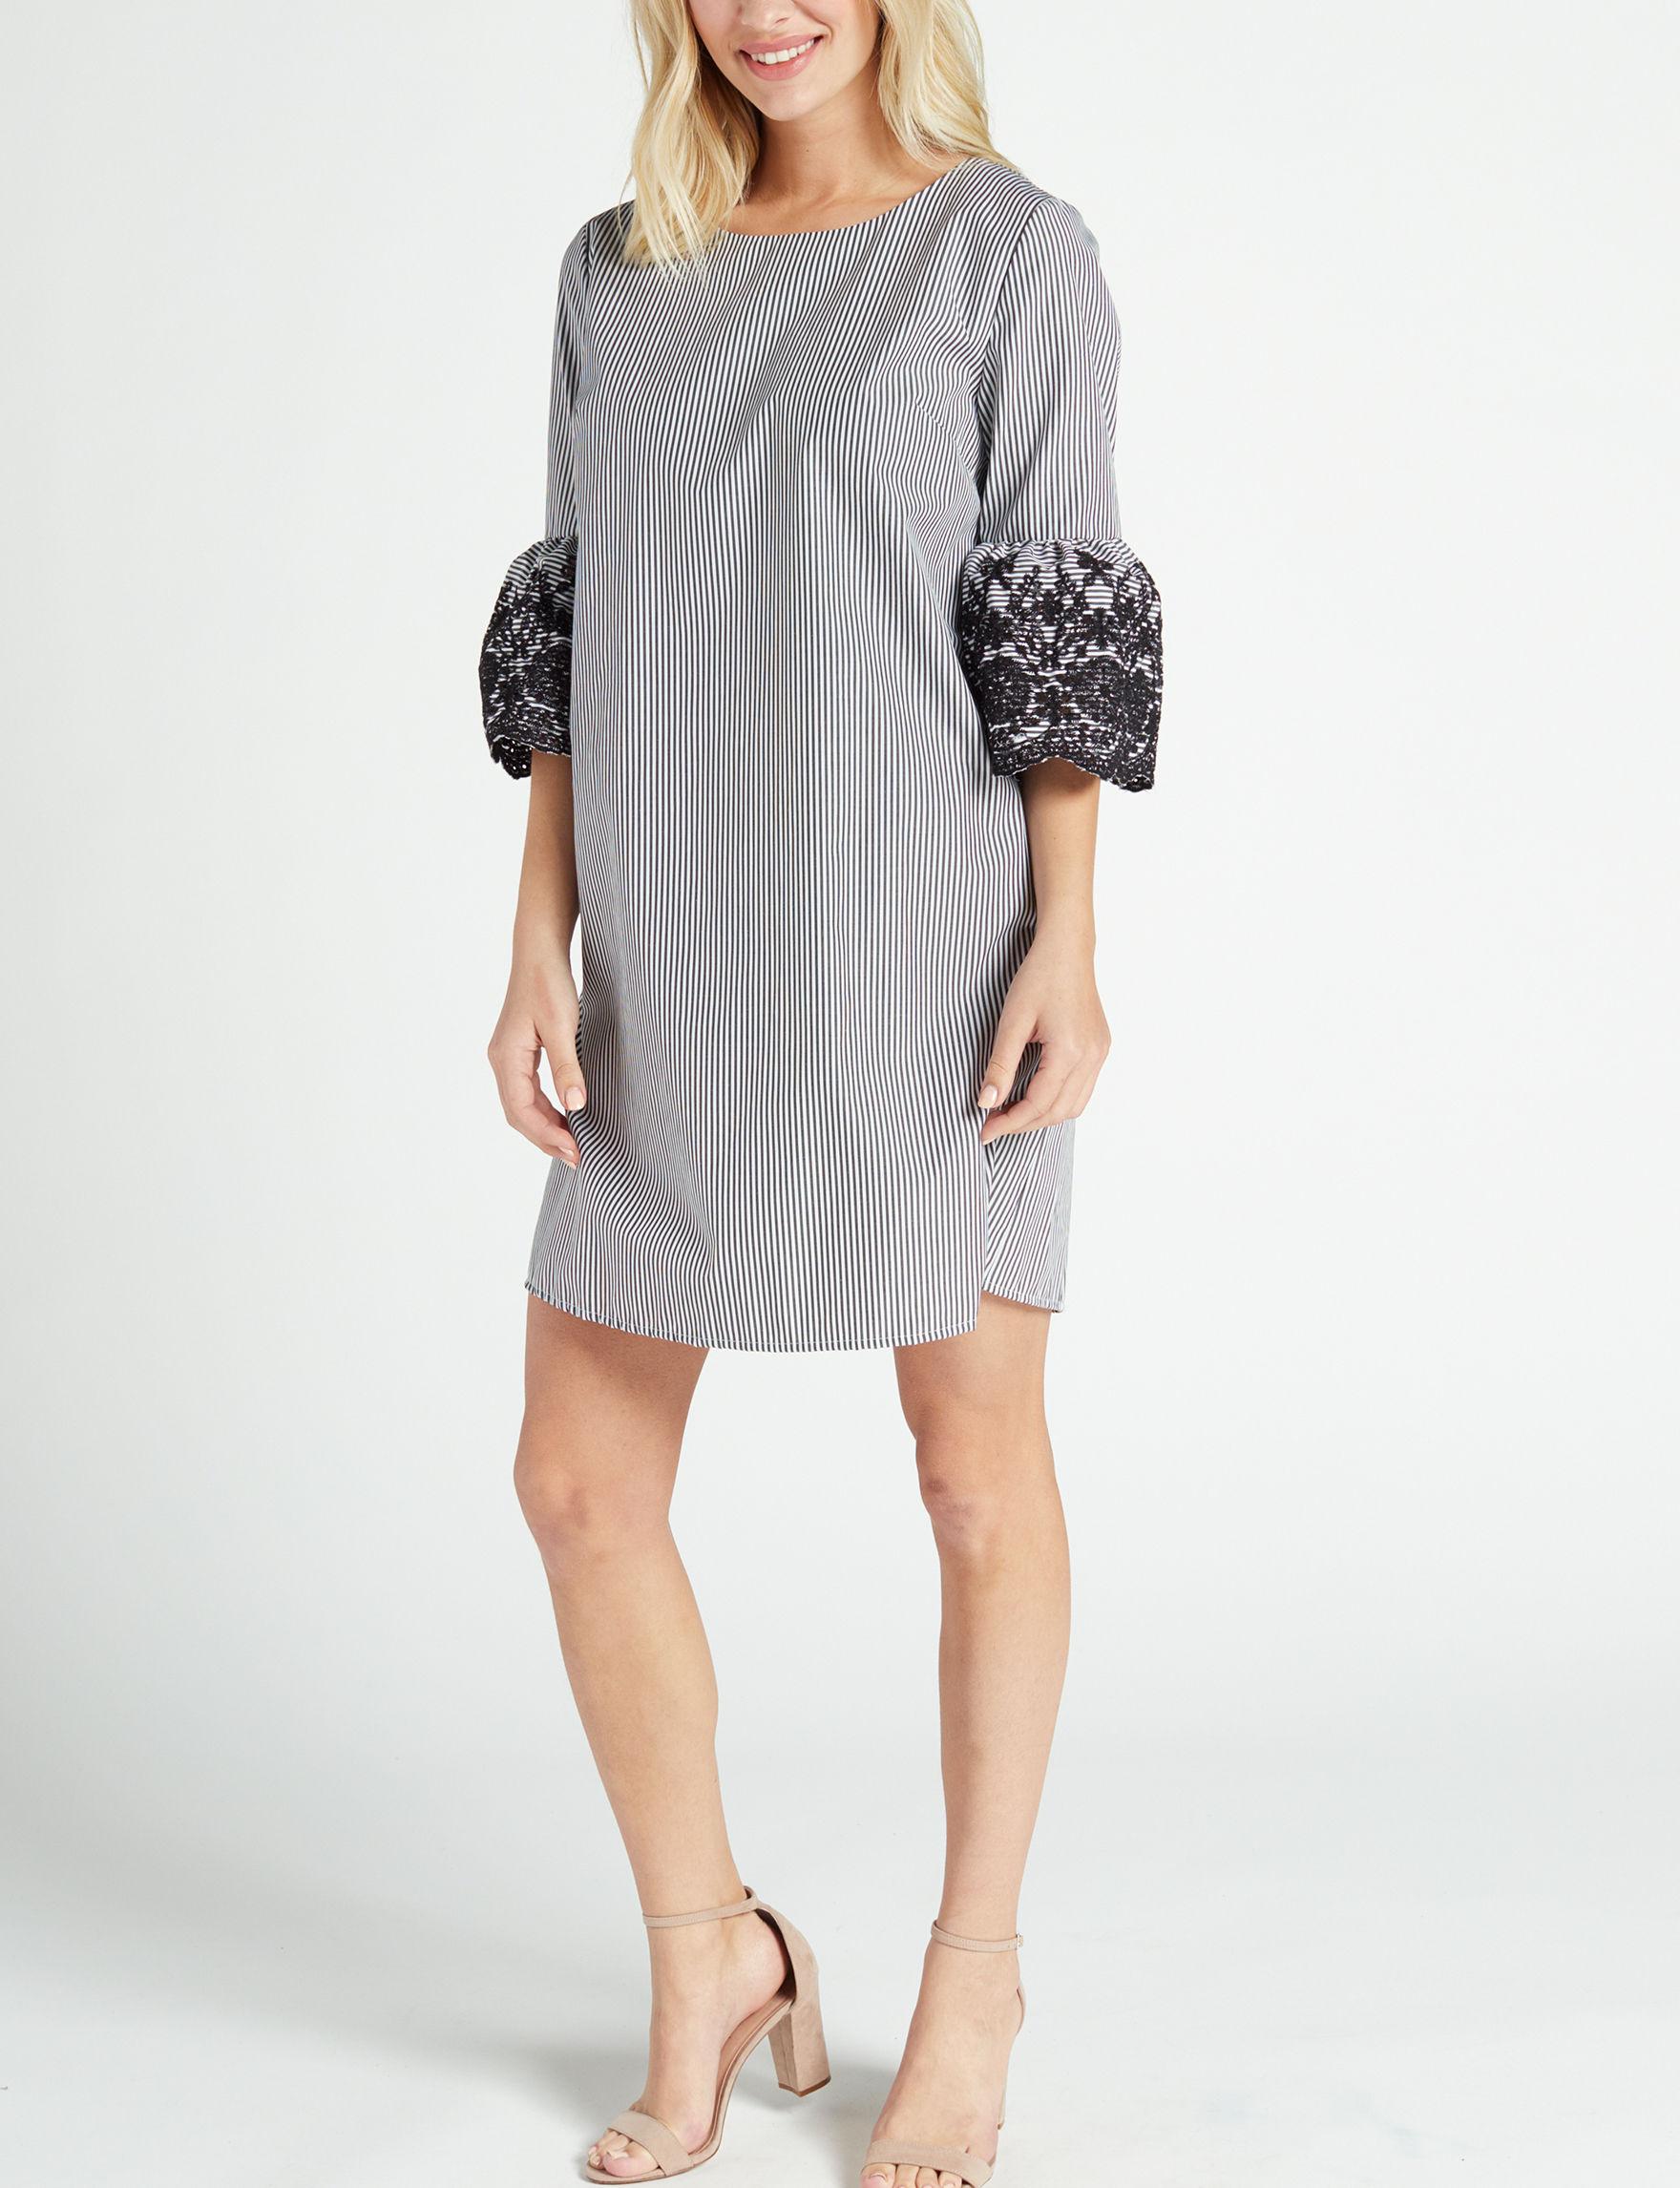 Nina Leonard Black /  White Everyday & Casual Shift Dresses